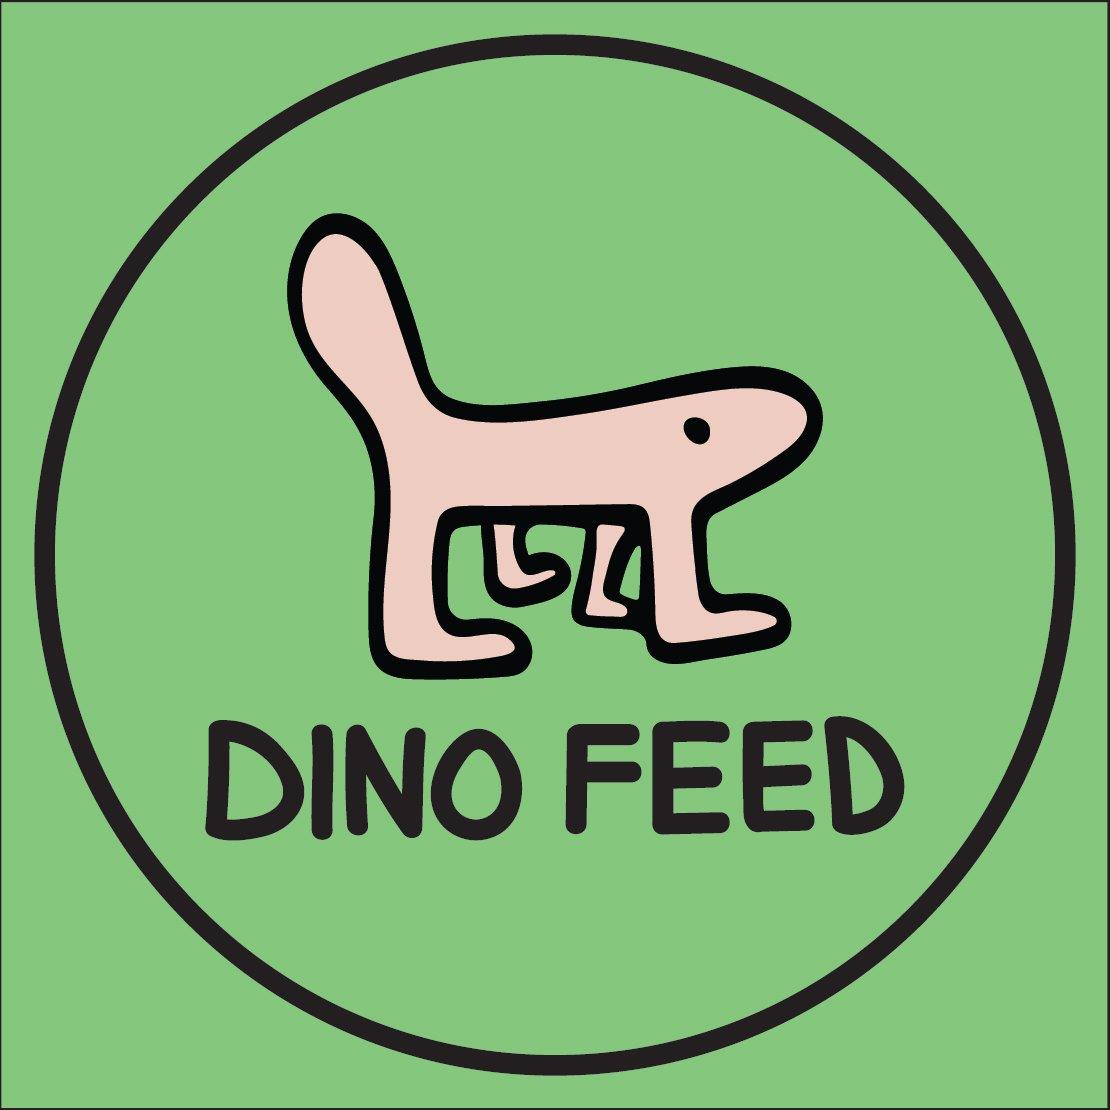 DINO FEED's account image